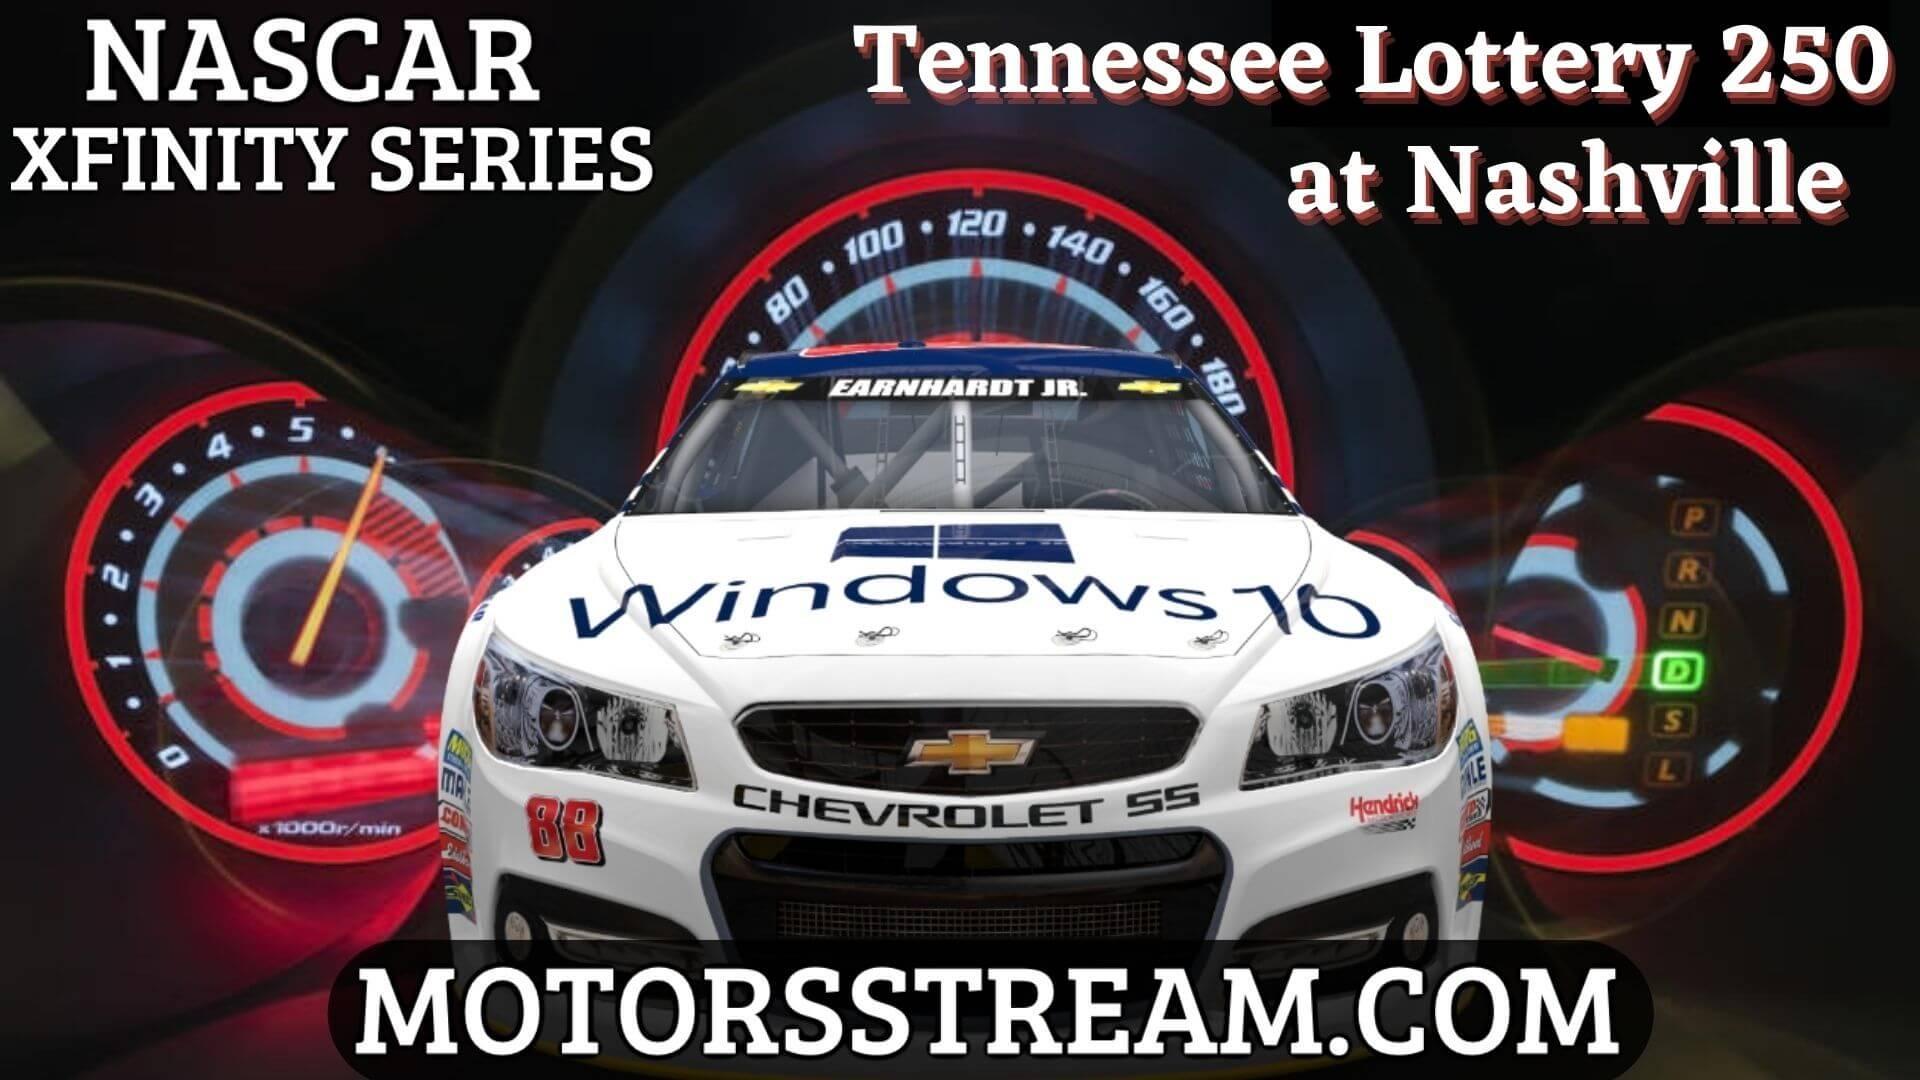 NASCAR Xfinity Tennessee Lottery 250 Live Stream